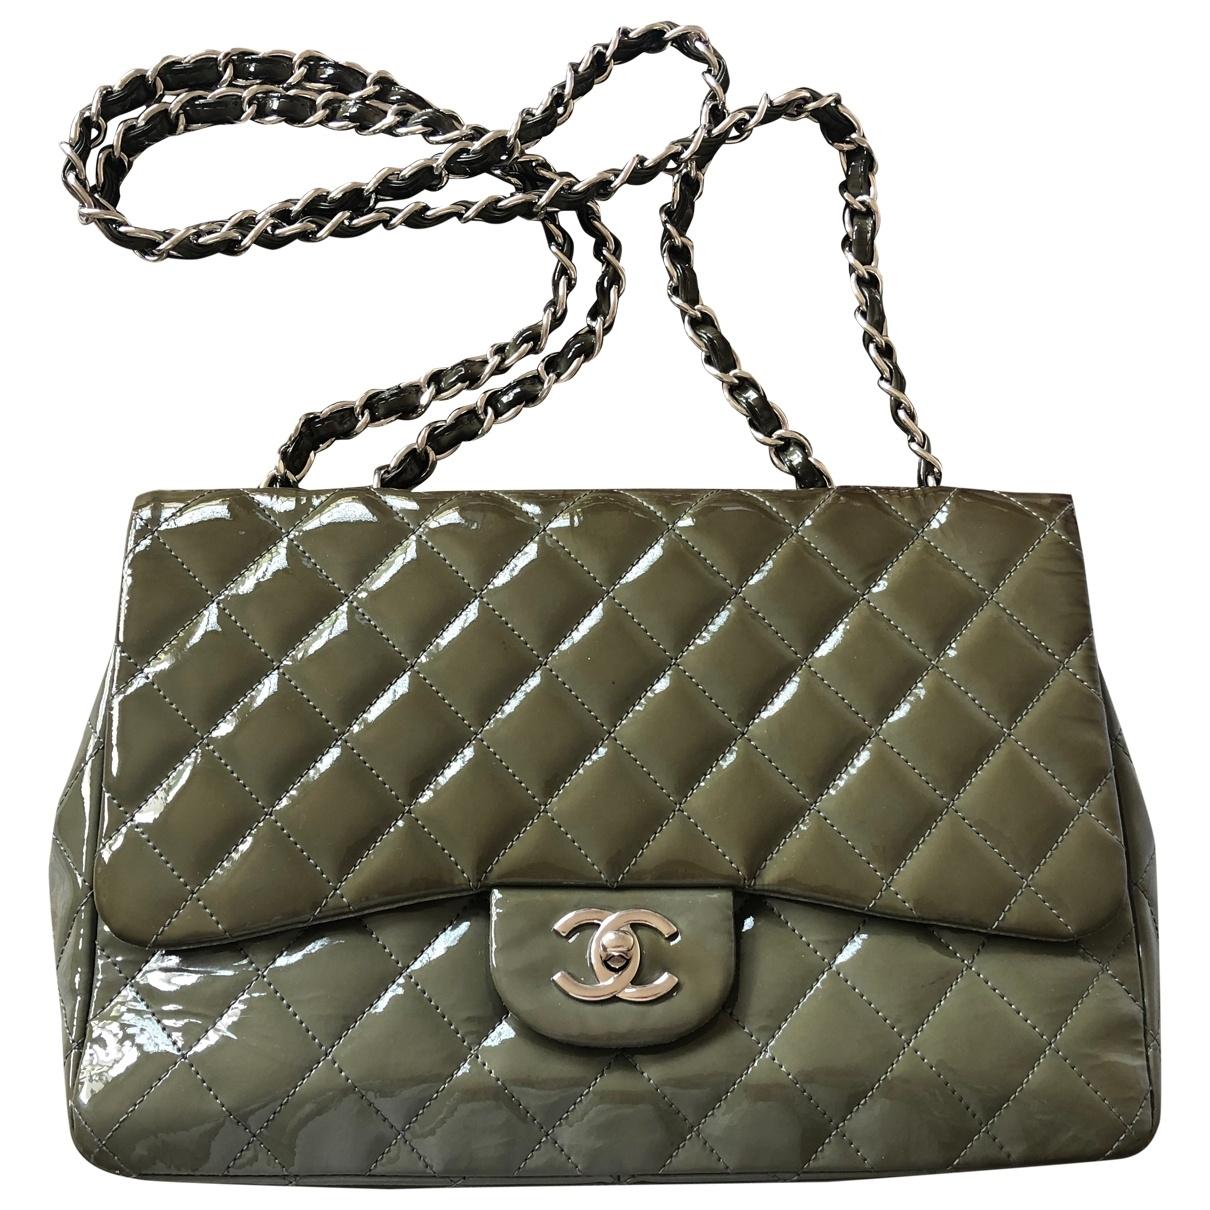 Chanel Timeless/Classique Khaki Patent leather handbag for Women \N